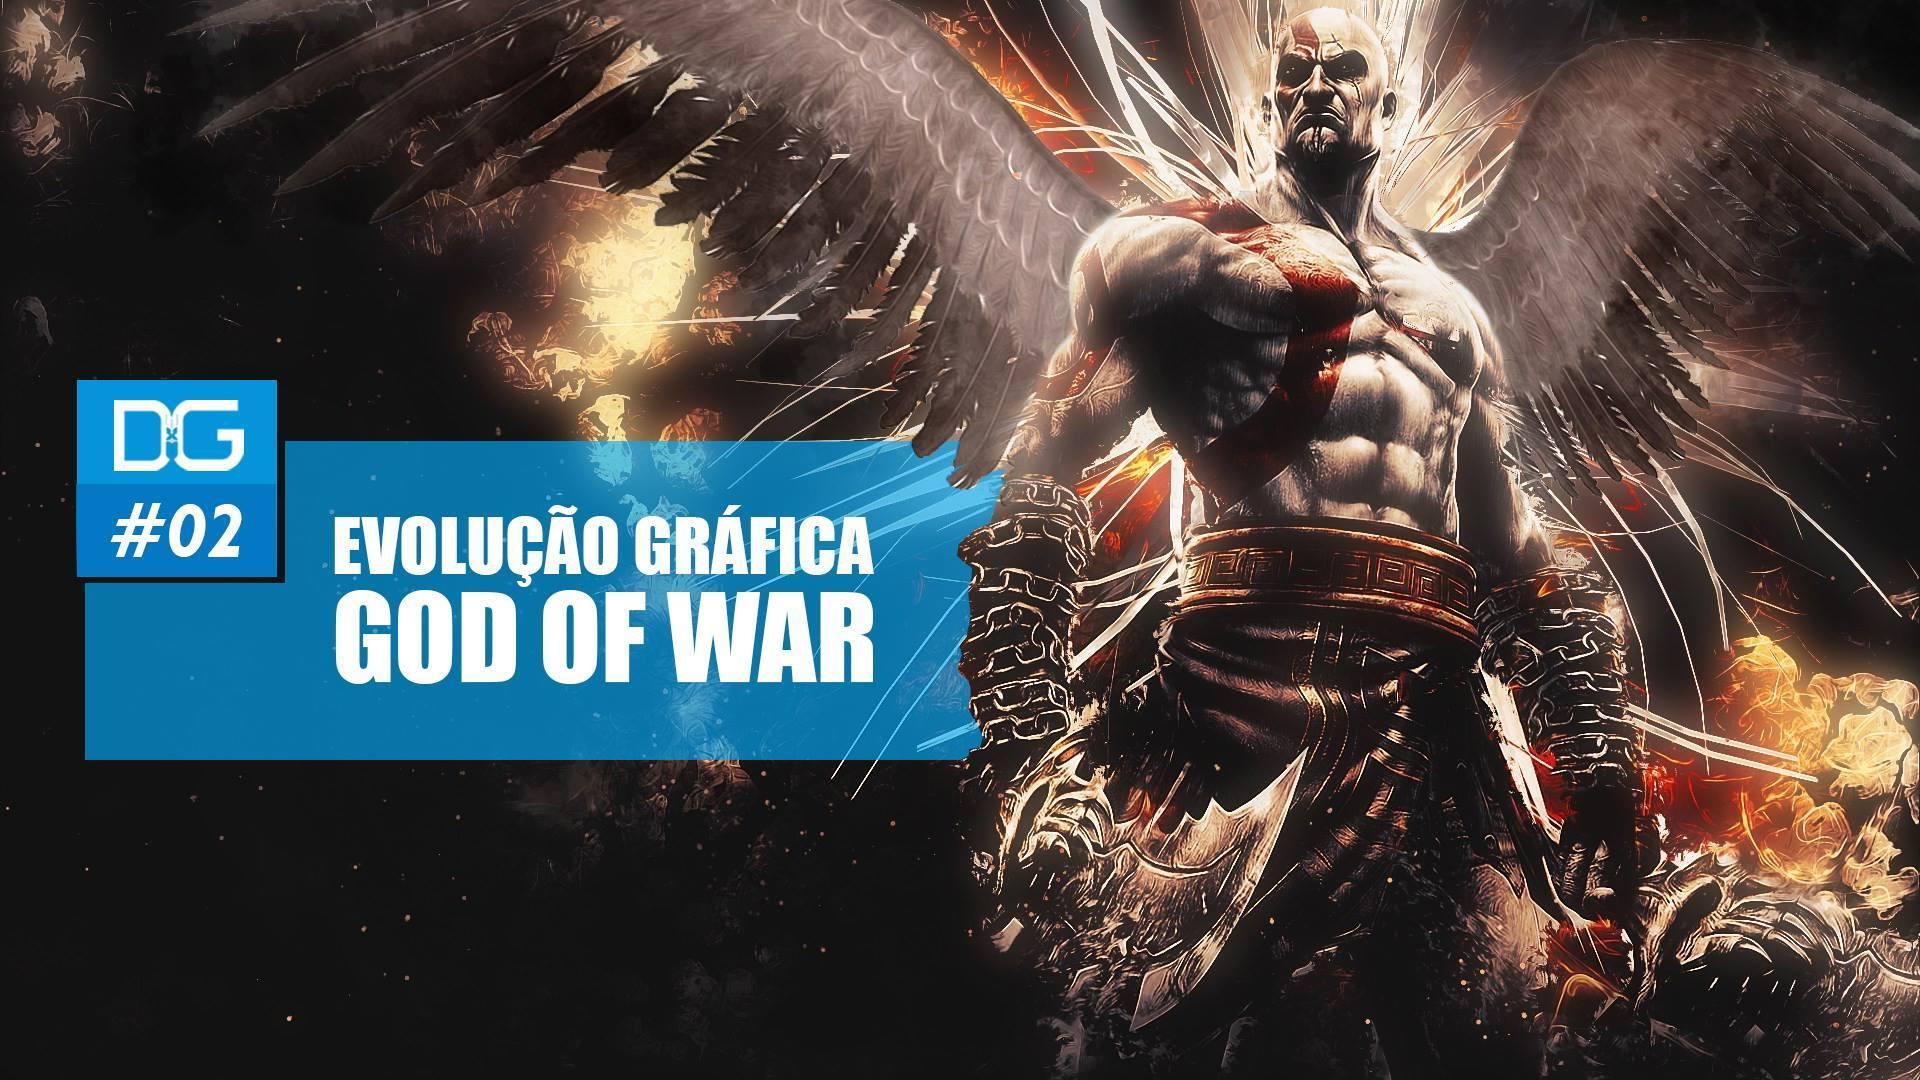 Evoluçao Gráfica - God of War - Kratos - Imagem